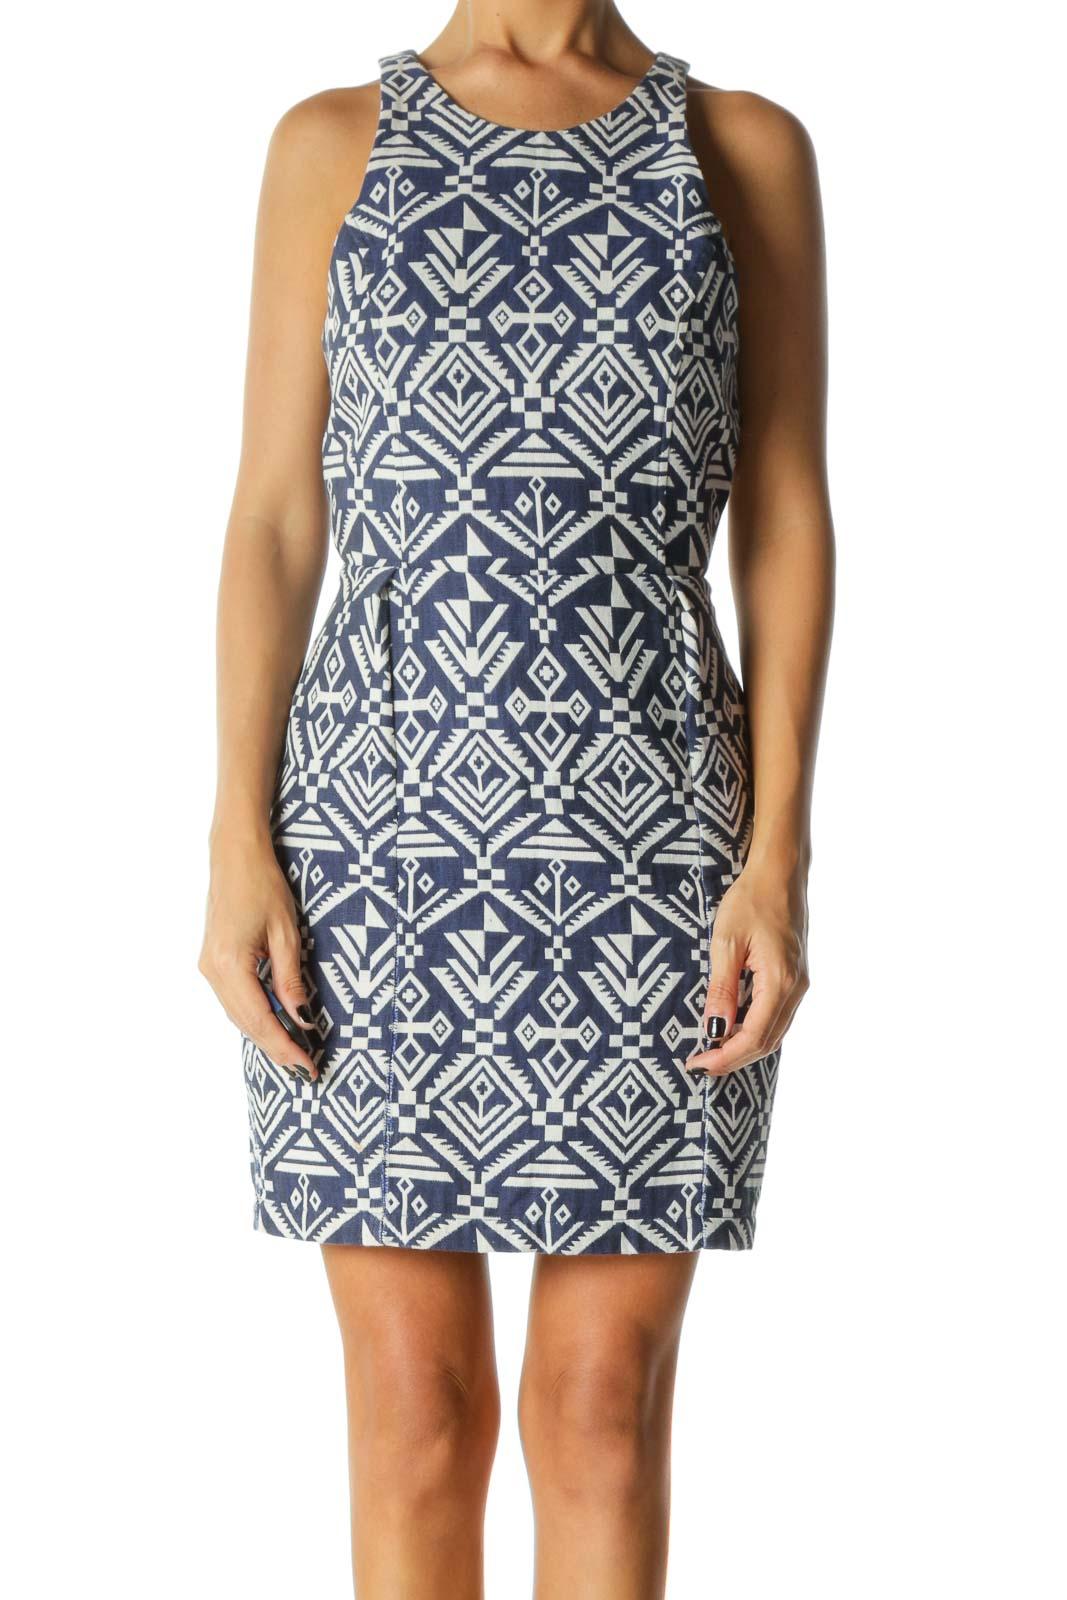 Blue & White Aztec Print Sleeveless Day Dress